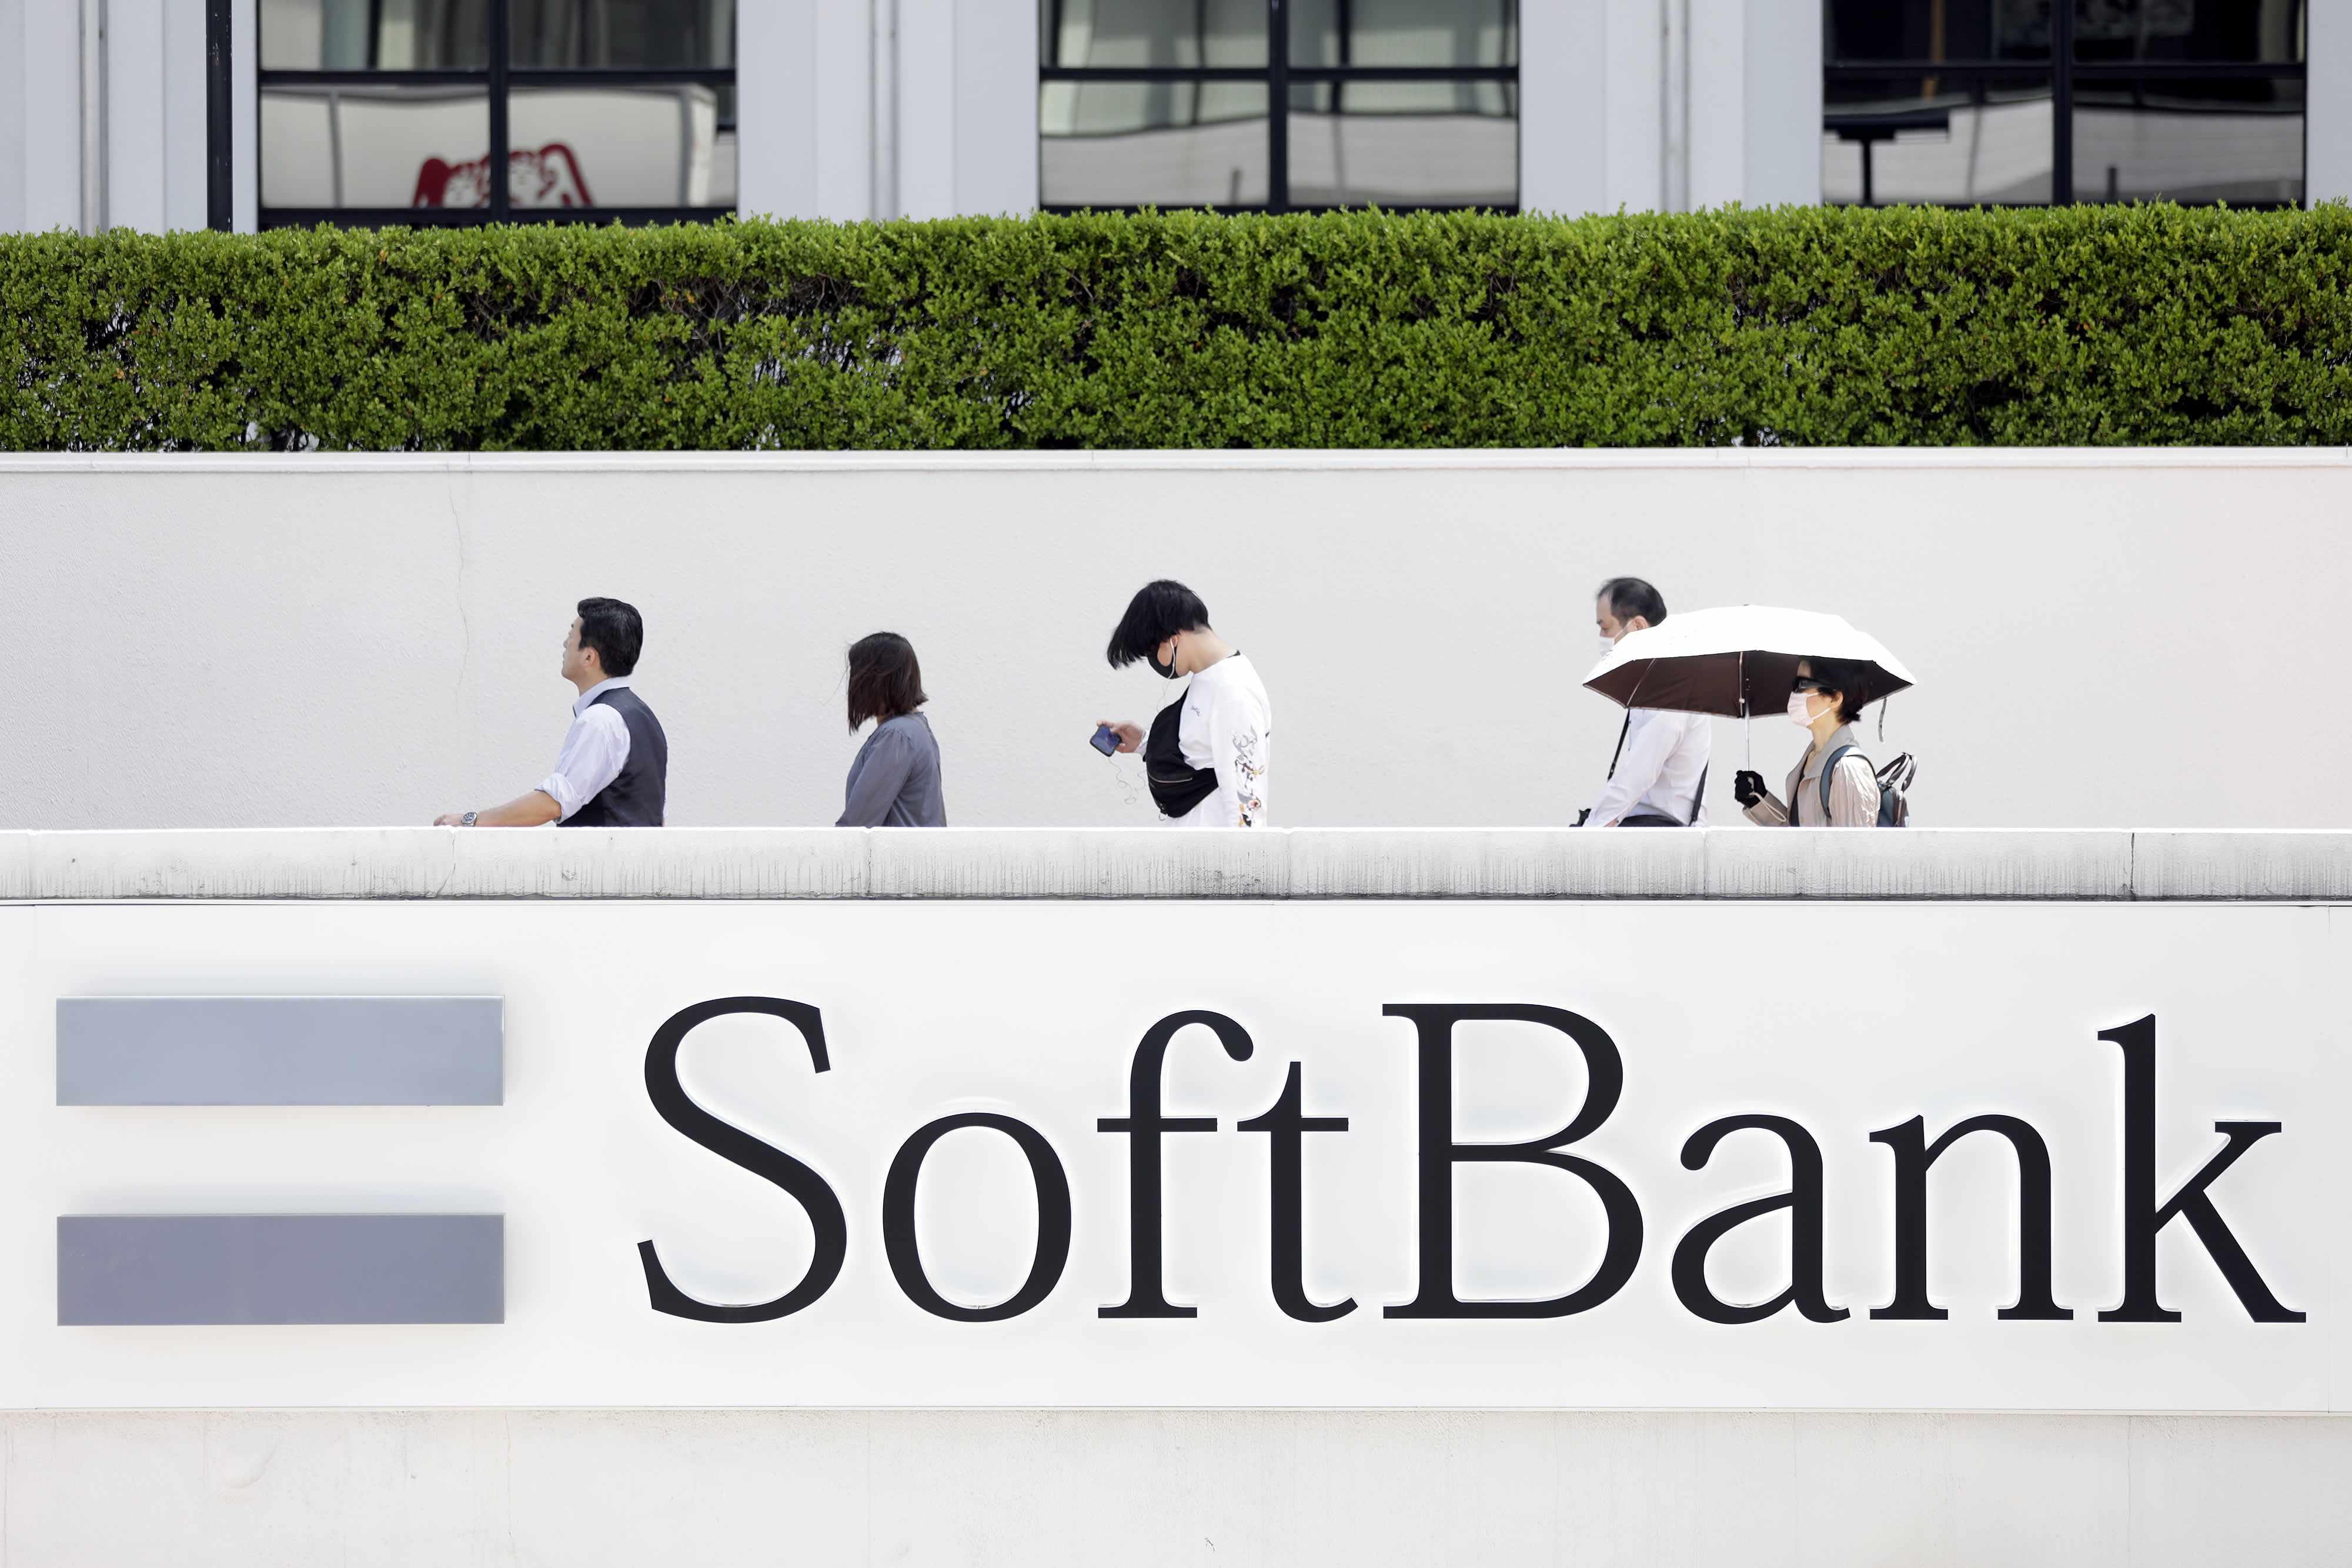 mortgage lender softbank digital company